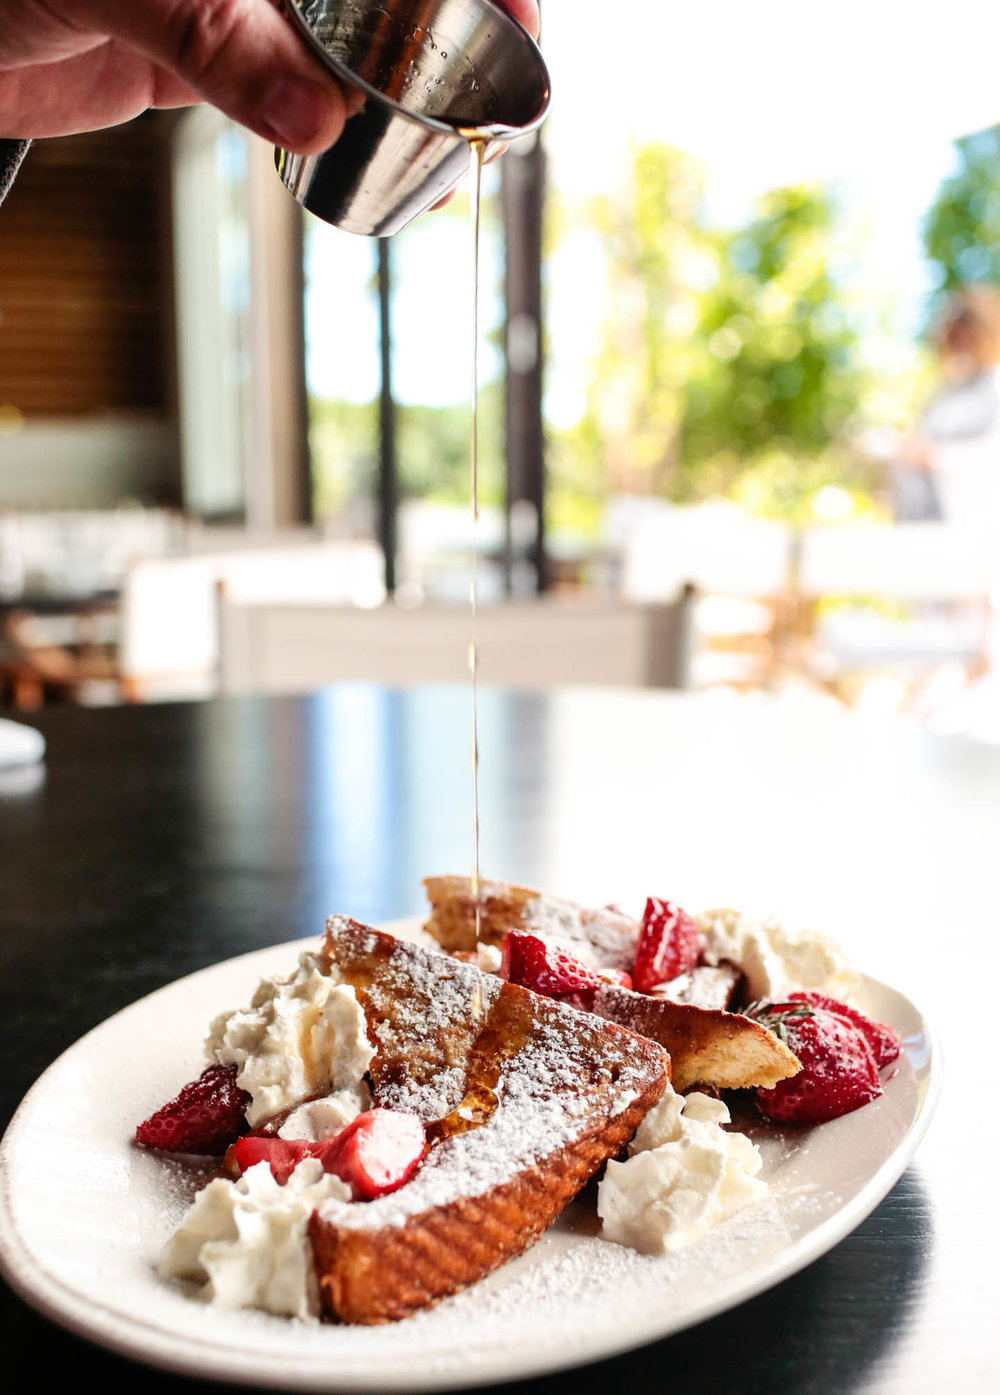 striffler-photography-lifestyle-food-Hamptons-37.jpg